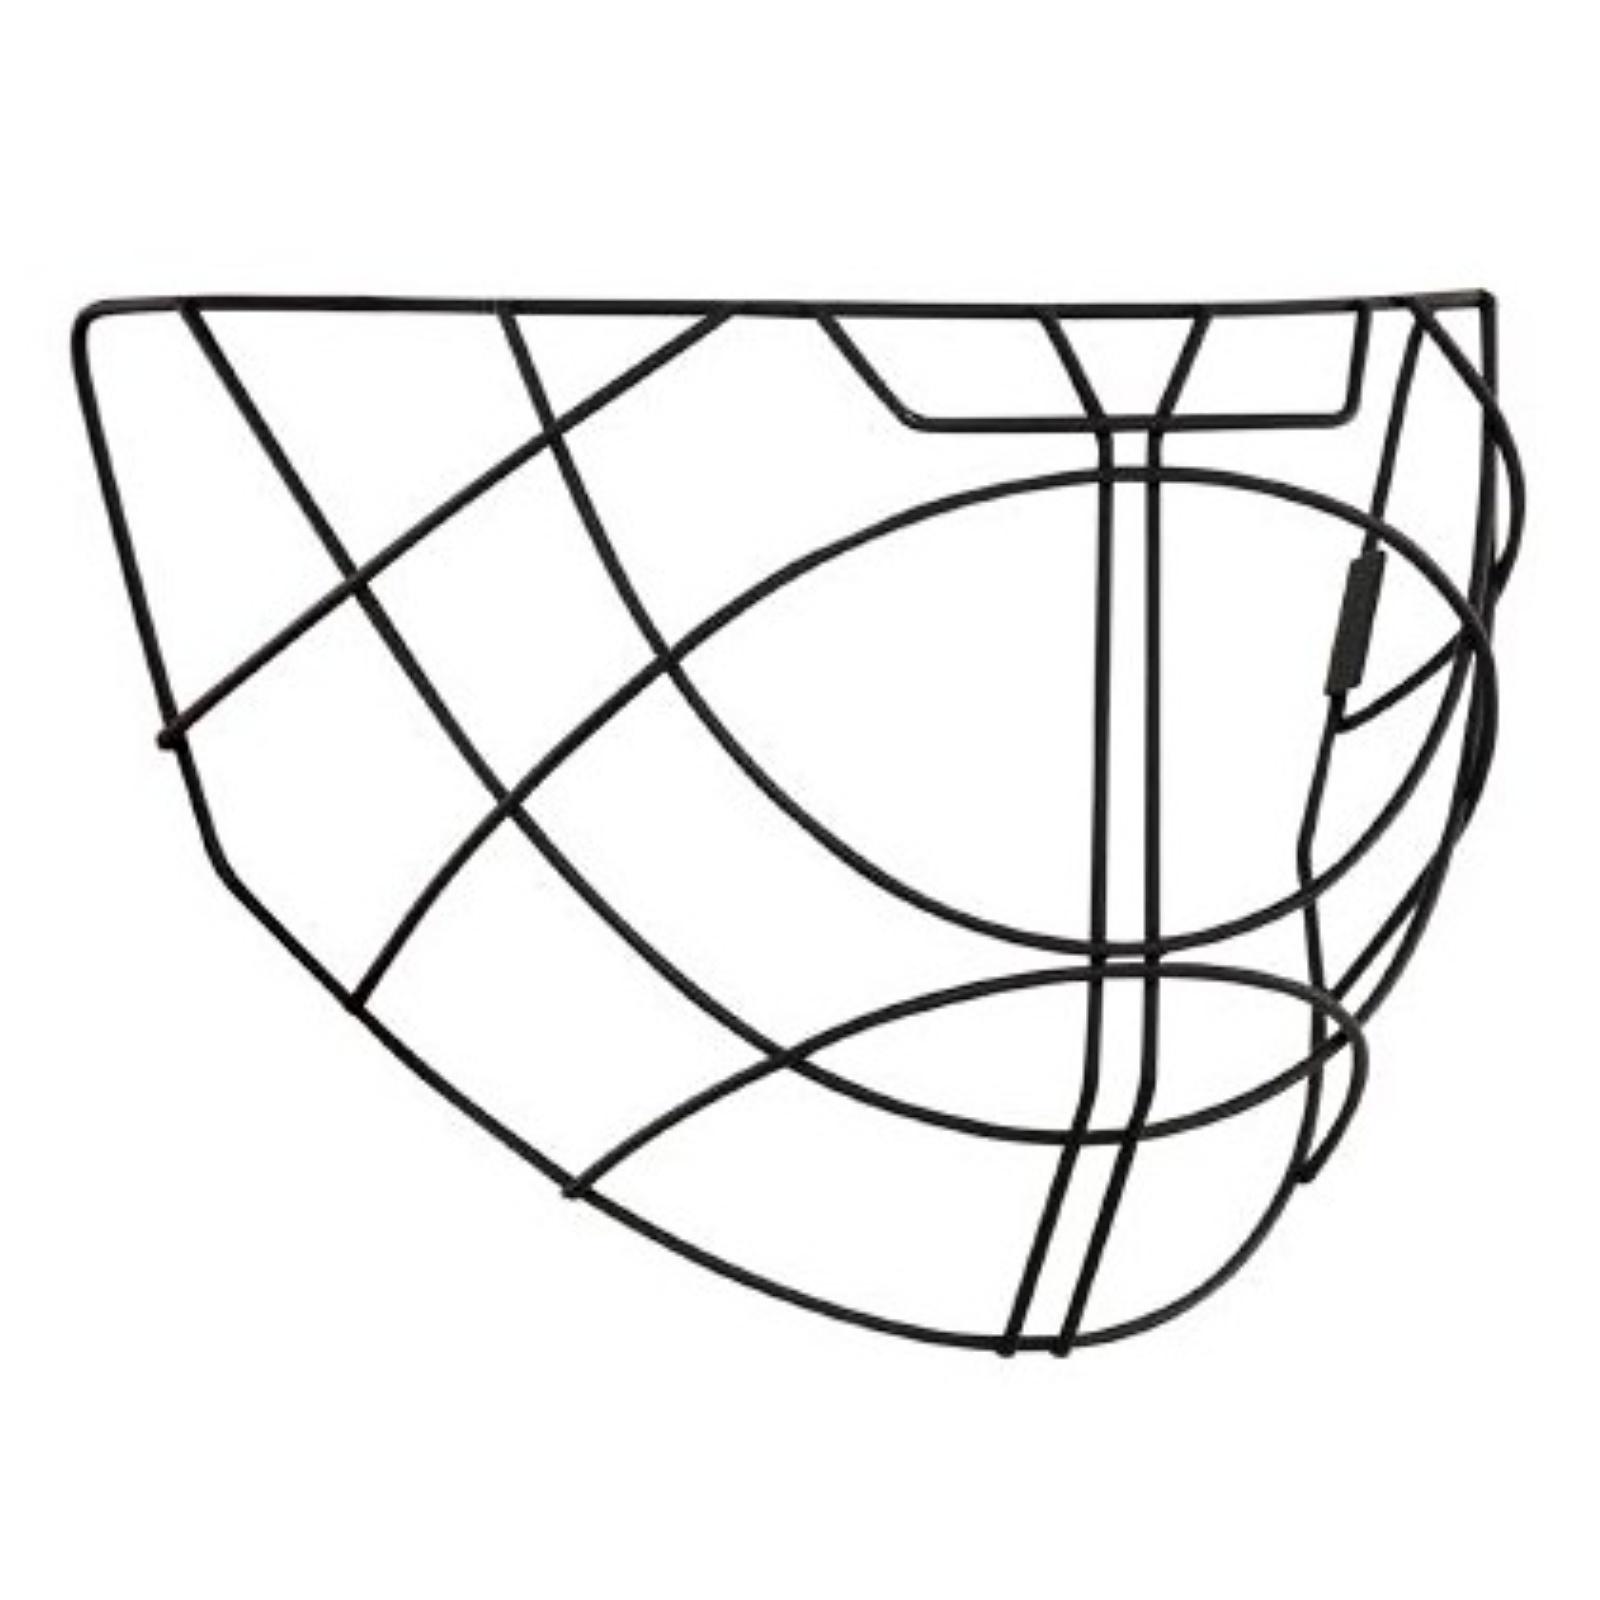 Florbalová mřížka SALMING Facial Wire Elite Helmet Dull černá